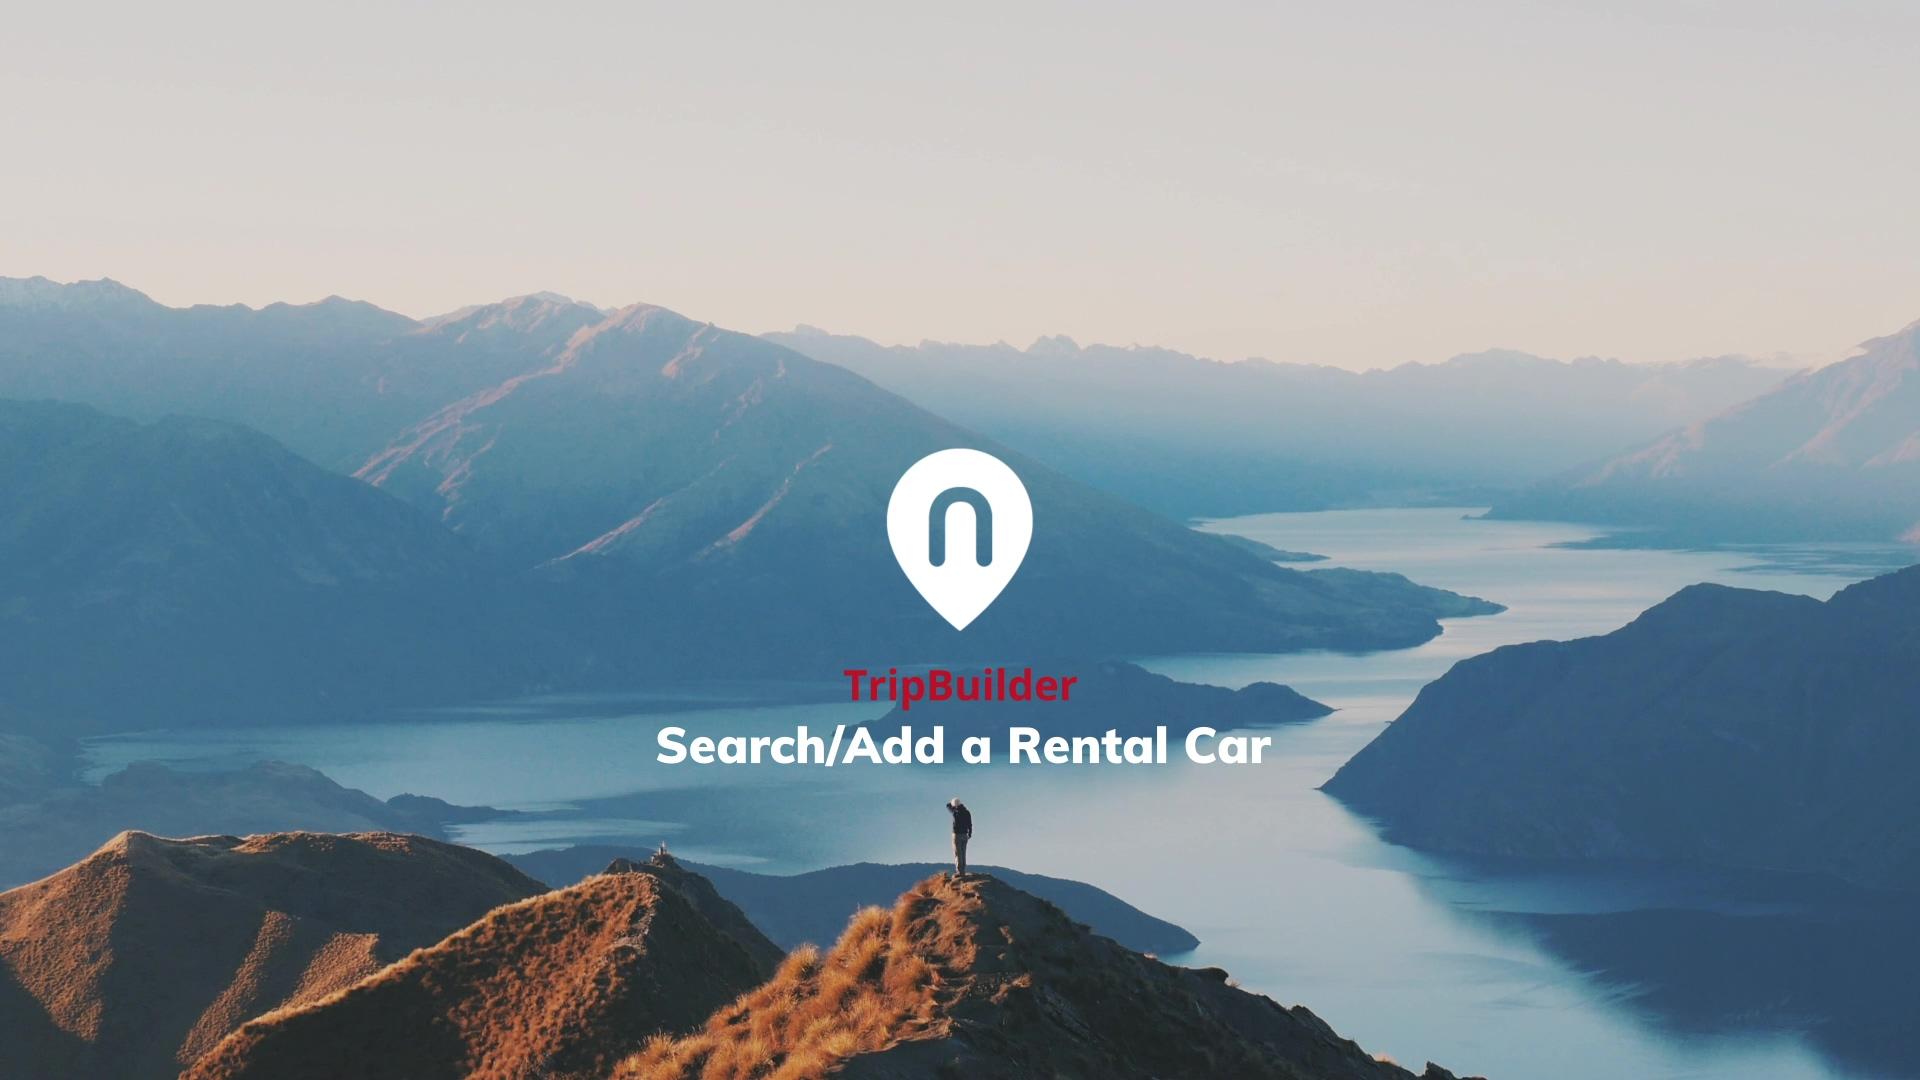 Search-Add a rental car 1080p